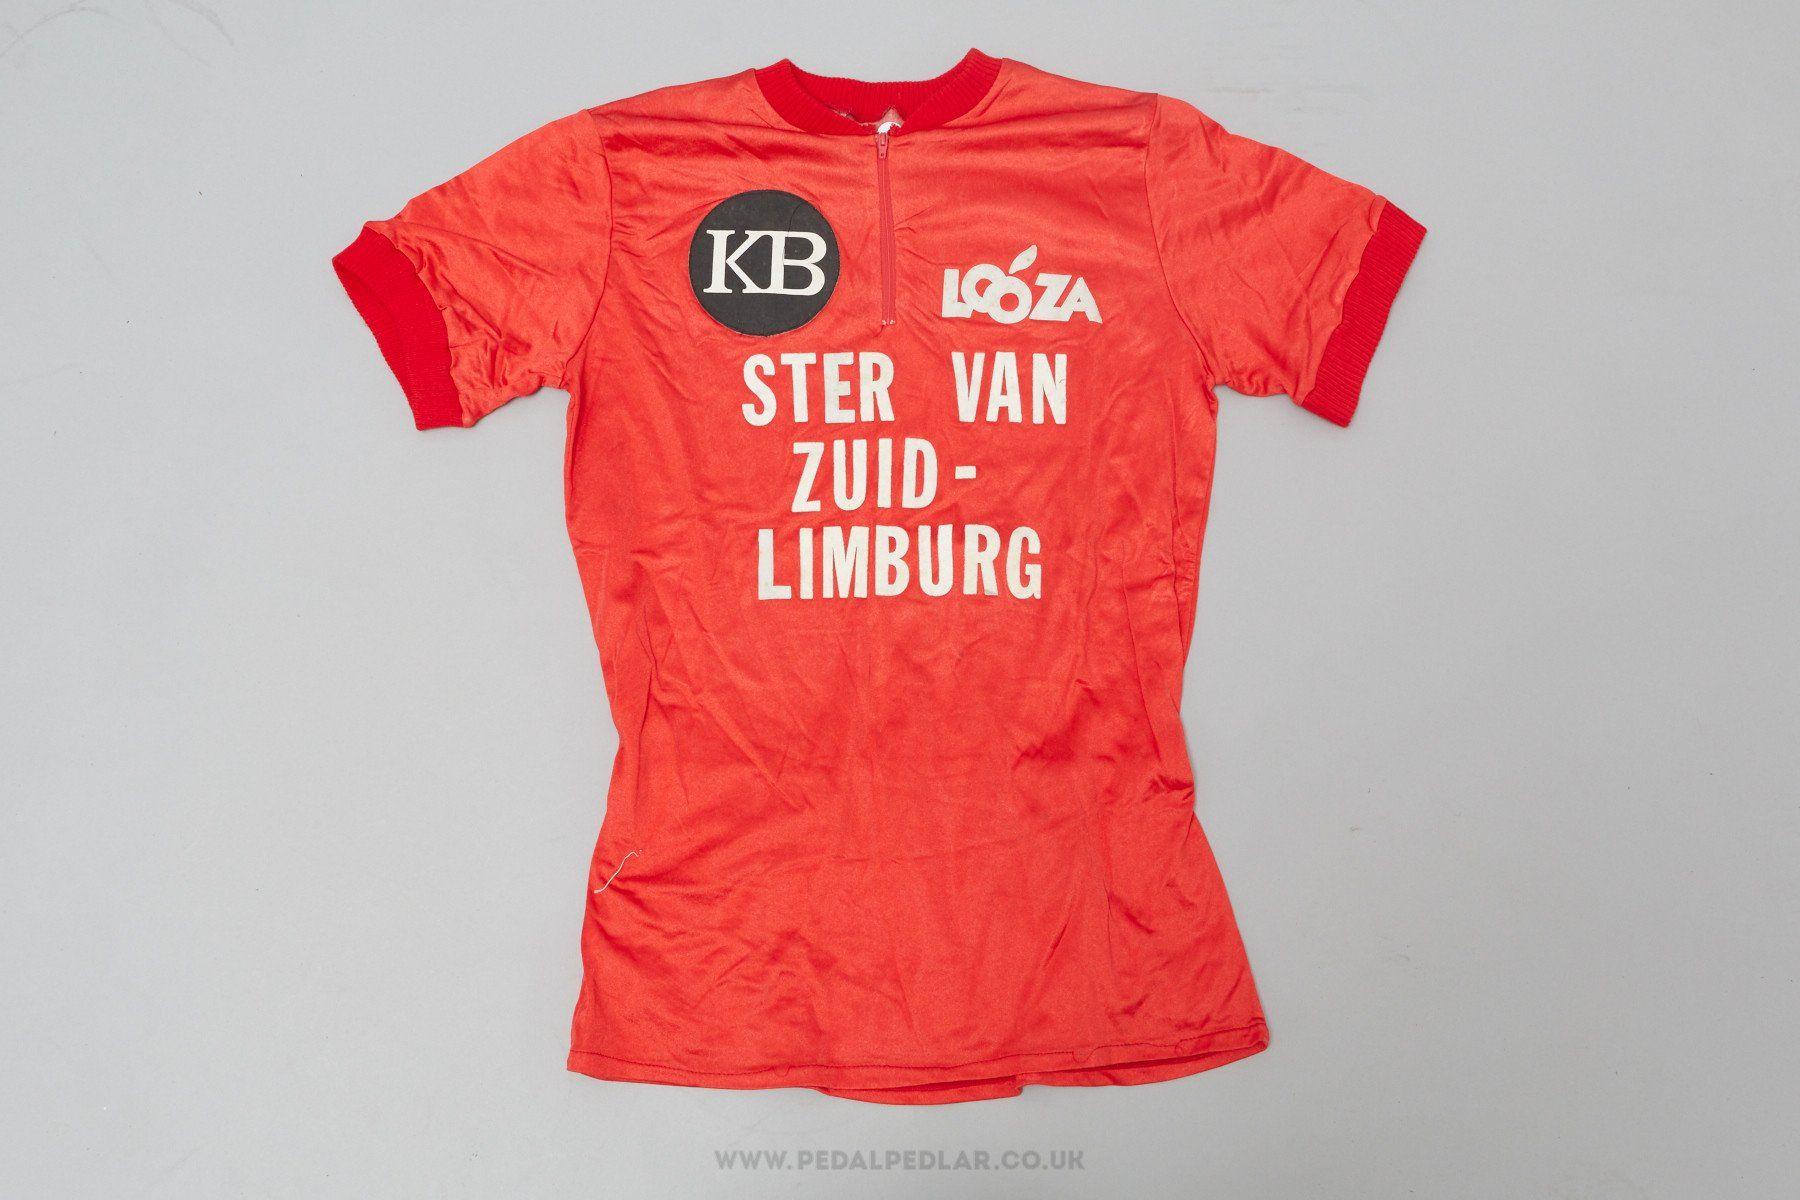 44680c3dc KB Looza Ster Van - Vintage Woollen Style Cycling Jersey - Pedal Pedlar